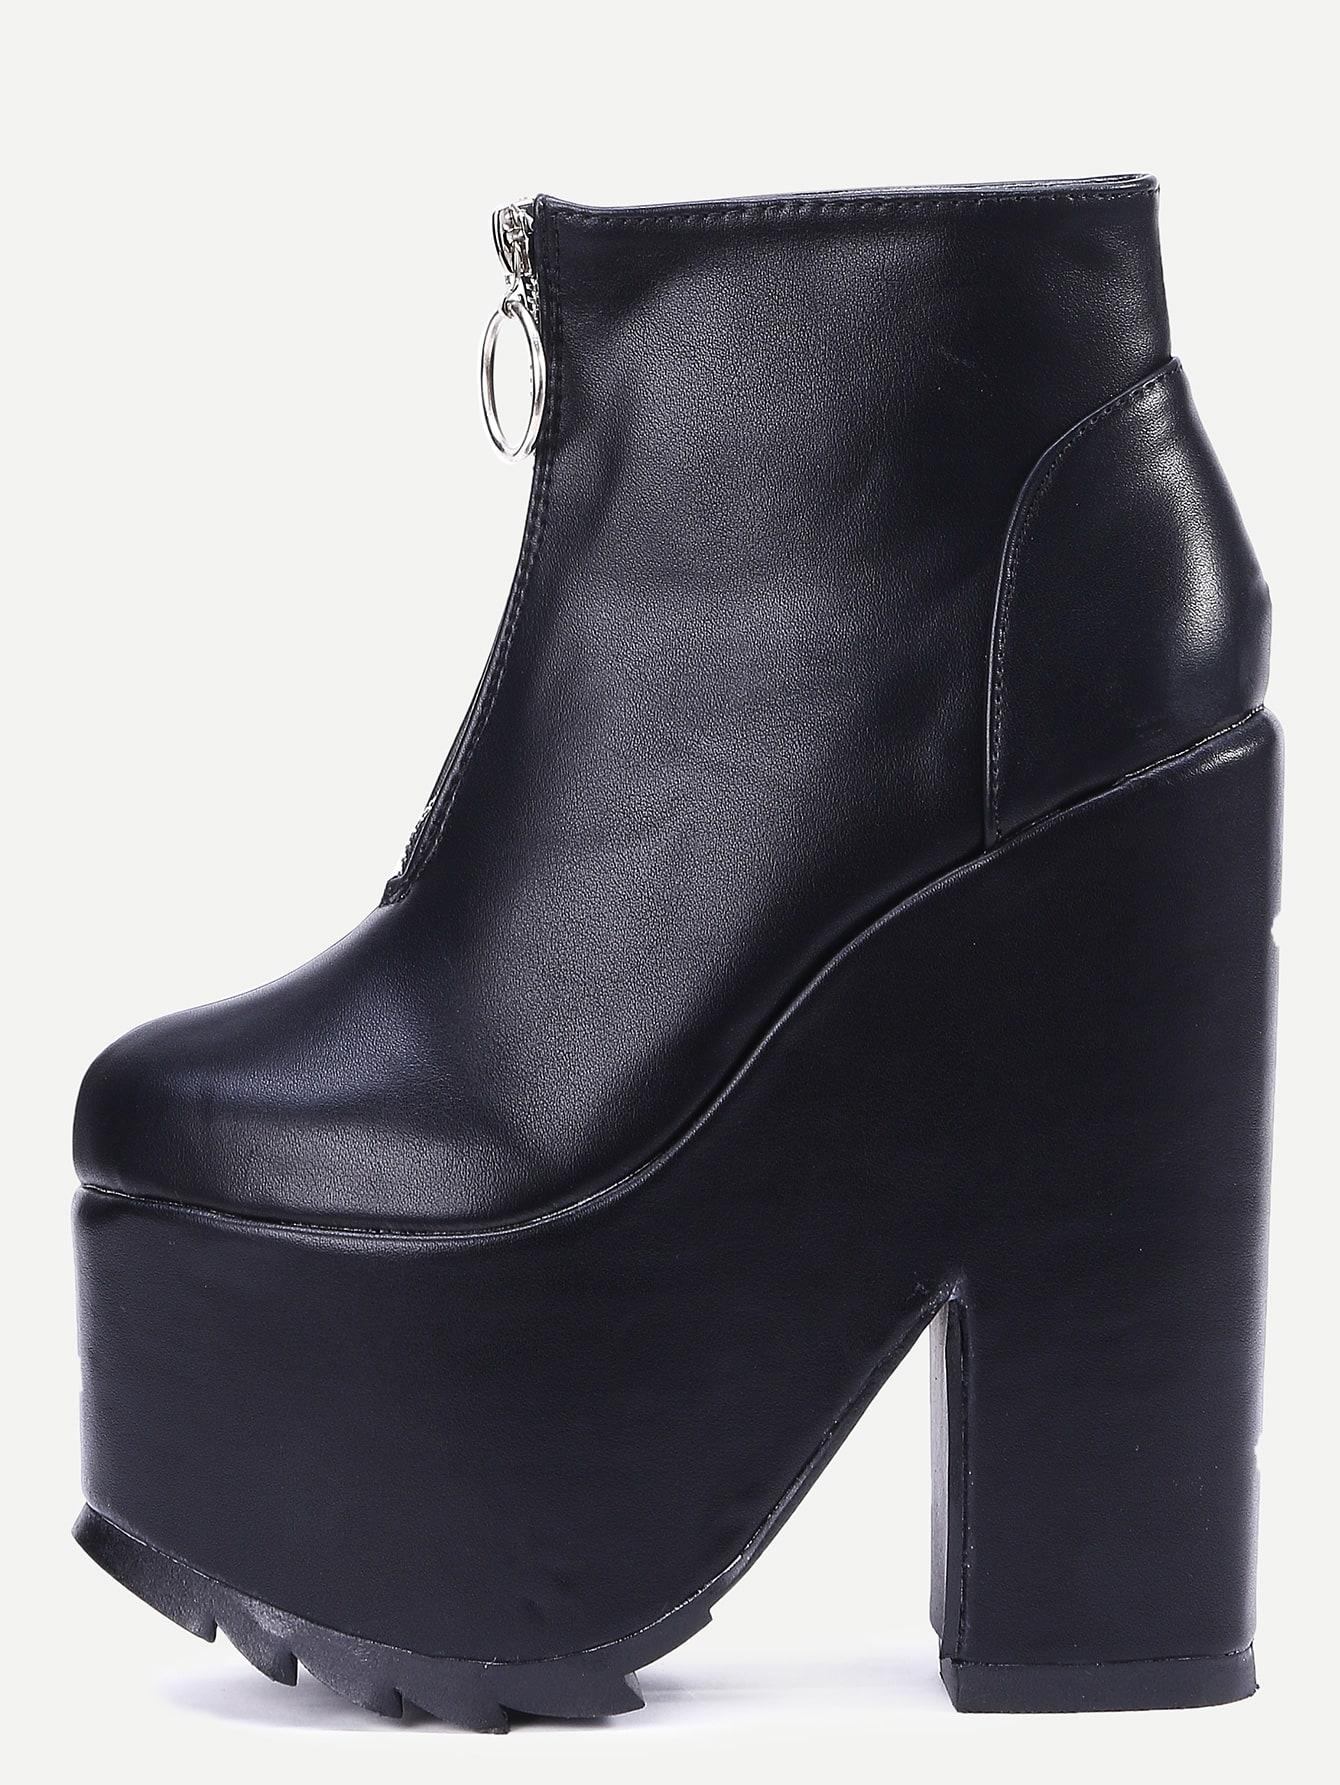 black faux leather zipper platform boots shein sheinside